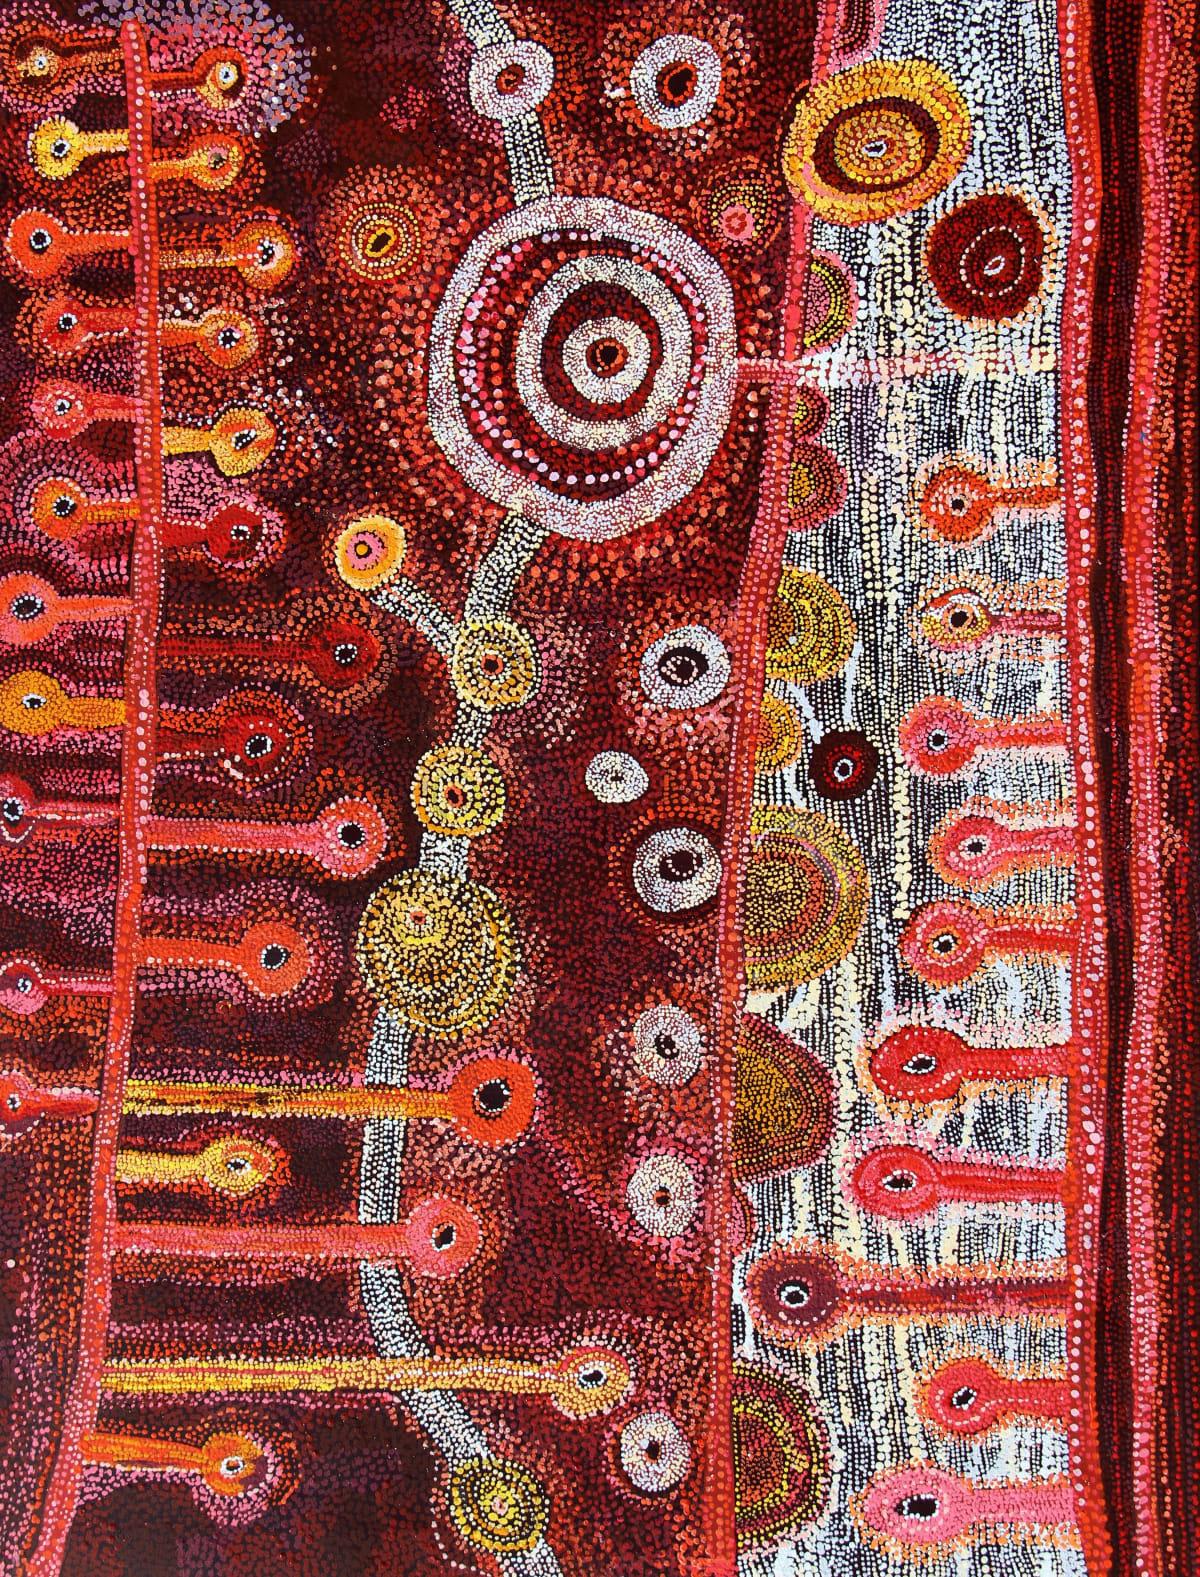 Rosalind Tjanyari Ngyuku Ngura Kuuti Uwankara acrylic on canvas 198 x 152 cm